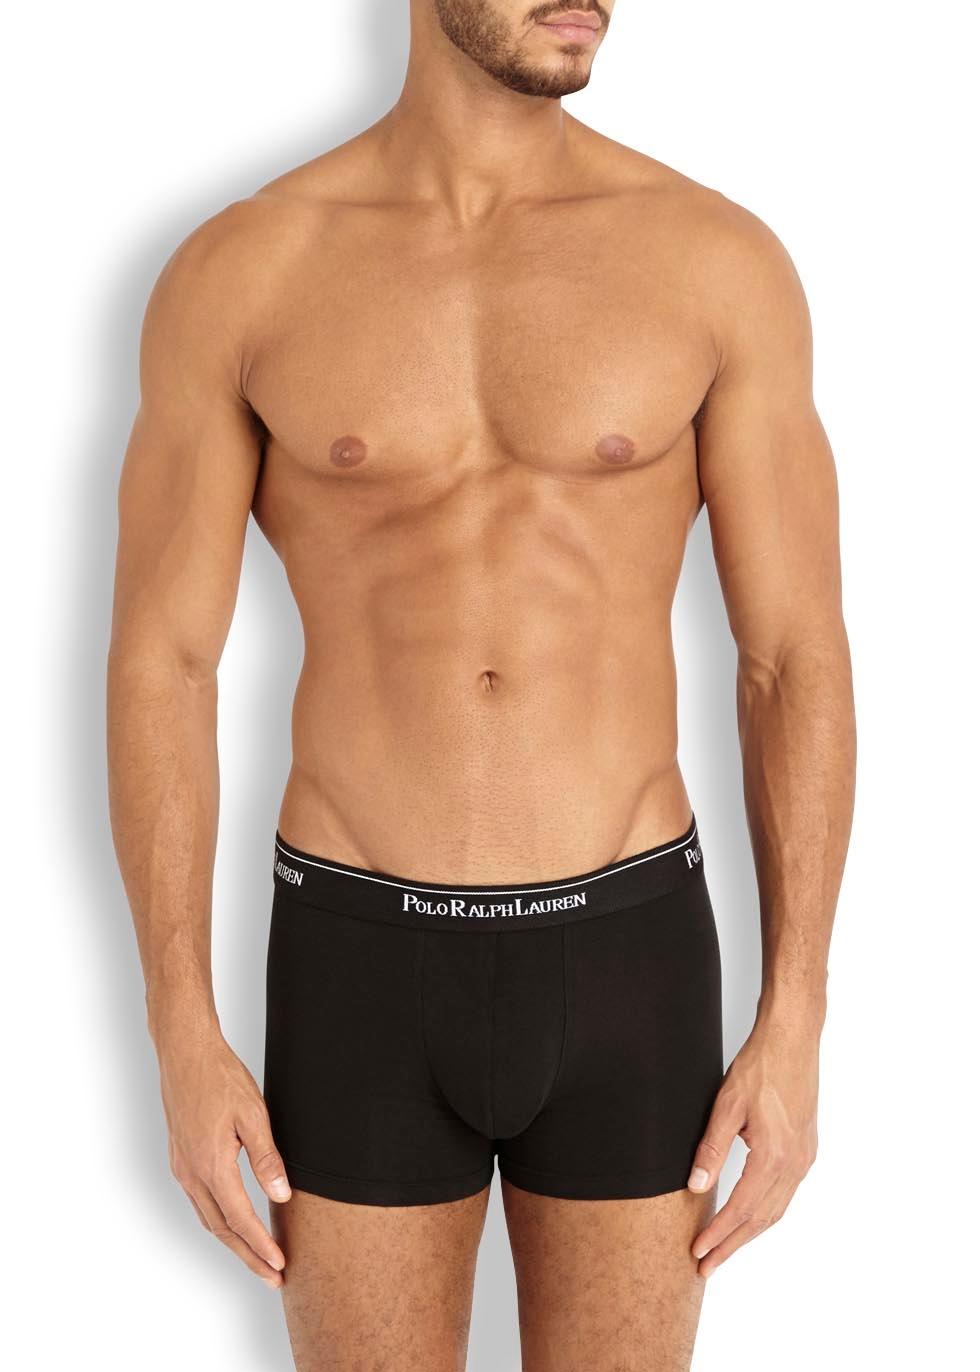 Black boxer briefs - set of three - Polo Ralph Lauren